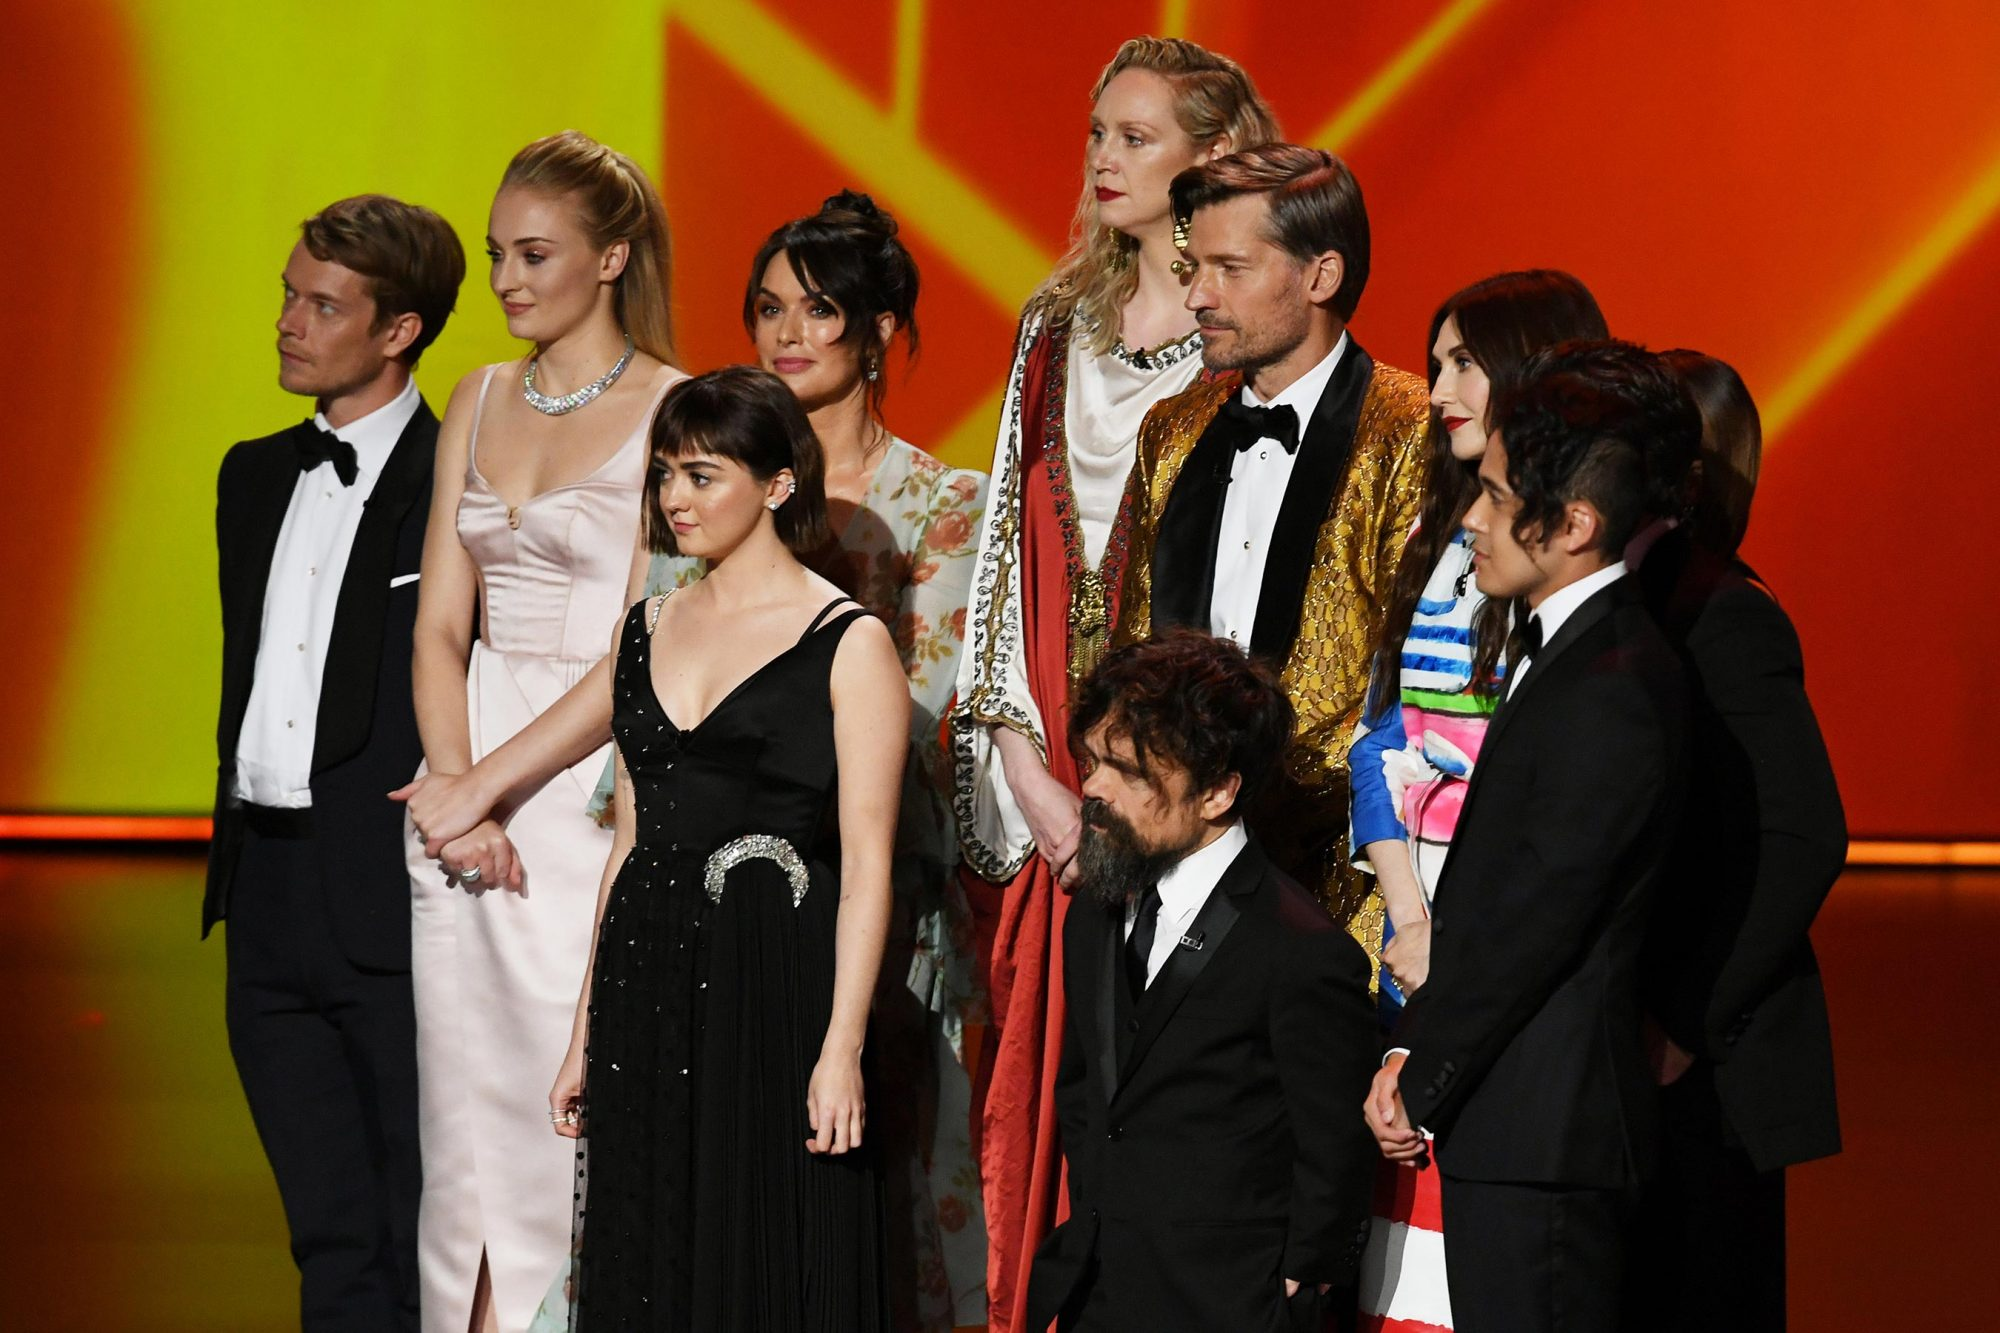 Alfie Allen, Sophie Turner, Maisie Williams, Lena Headey, Gwendoline Christie, Nikolaj Coster-Waldau, Peter Dinklage, and Carice van Houten